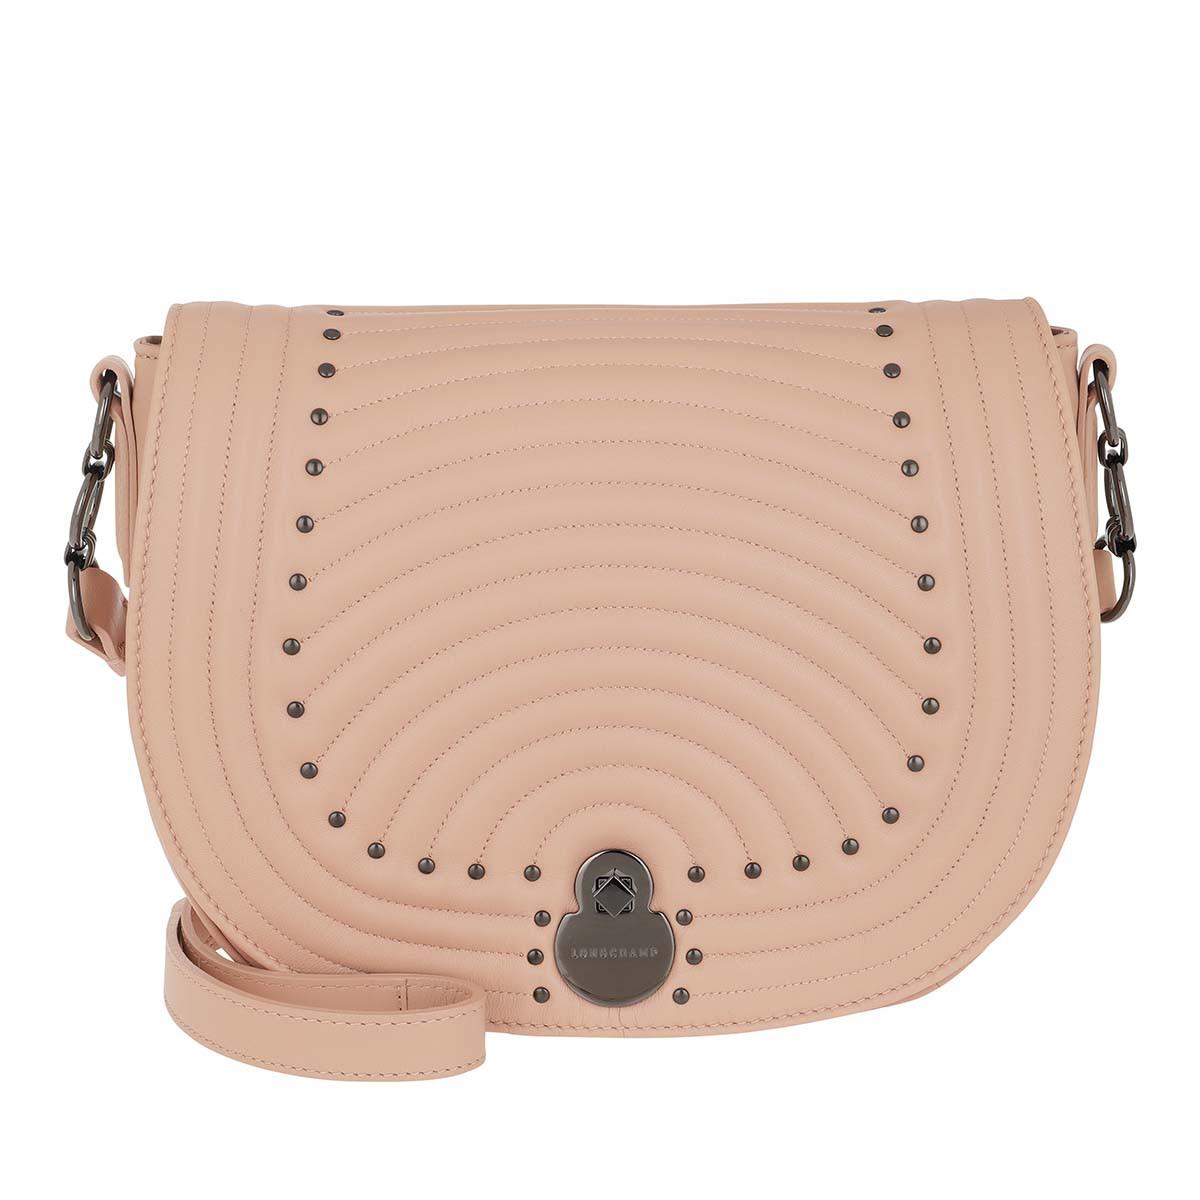 Longchamp Umhängetasche - Cavalcade Matelassé Crossbody Bag Rose - in rosa - für Damen